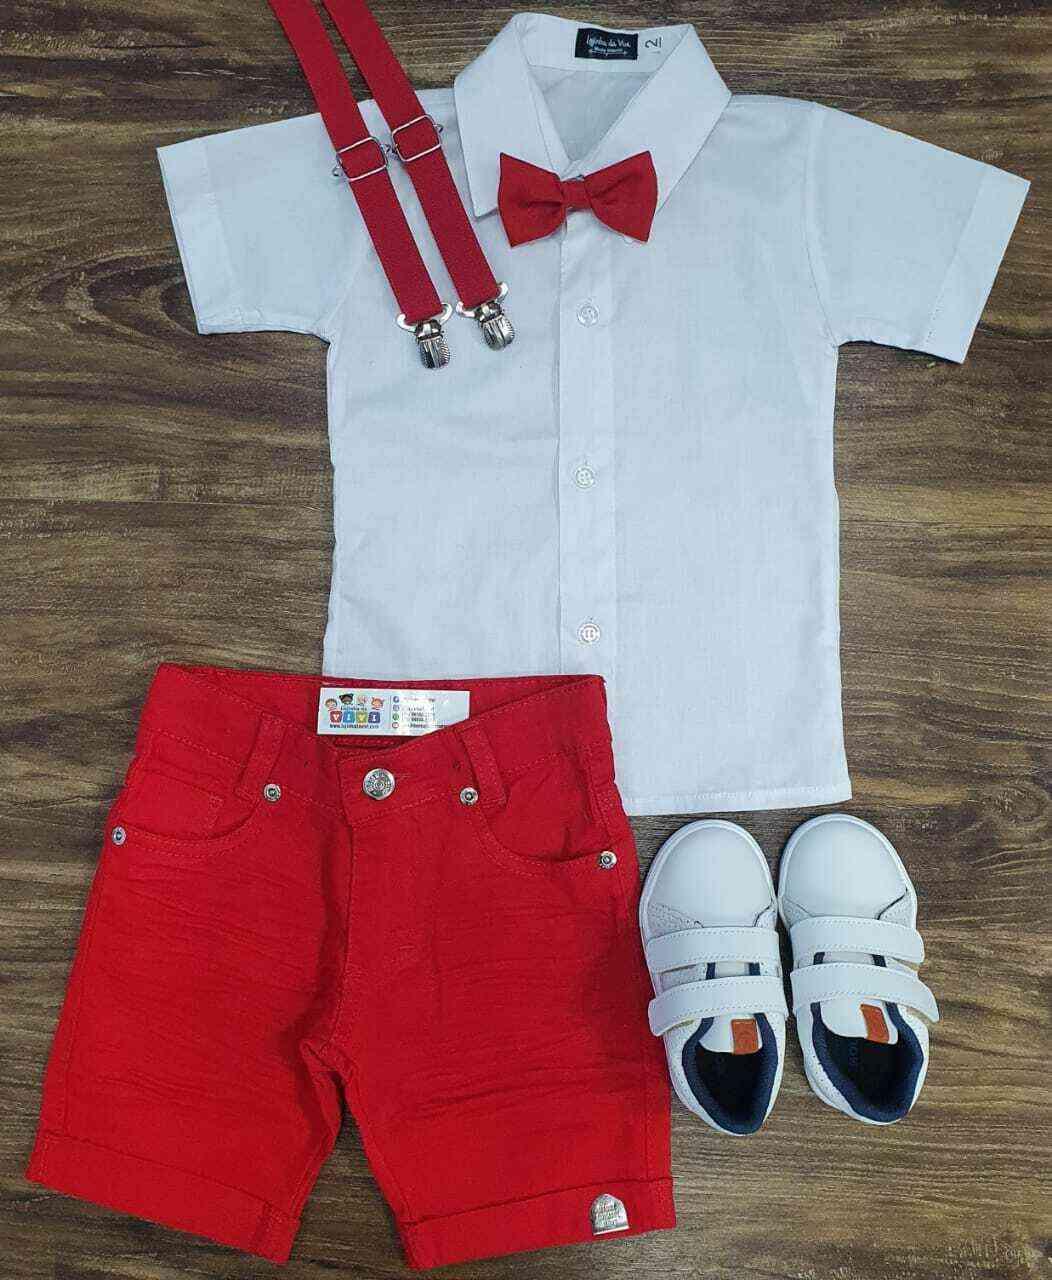 Bermuda vermelha com camisa branca manga curta